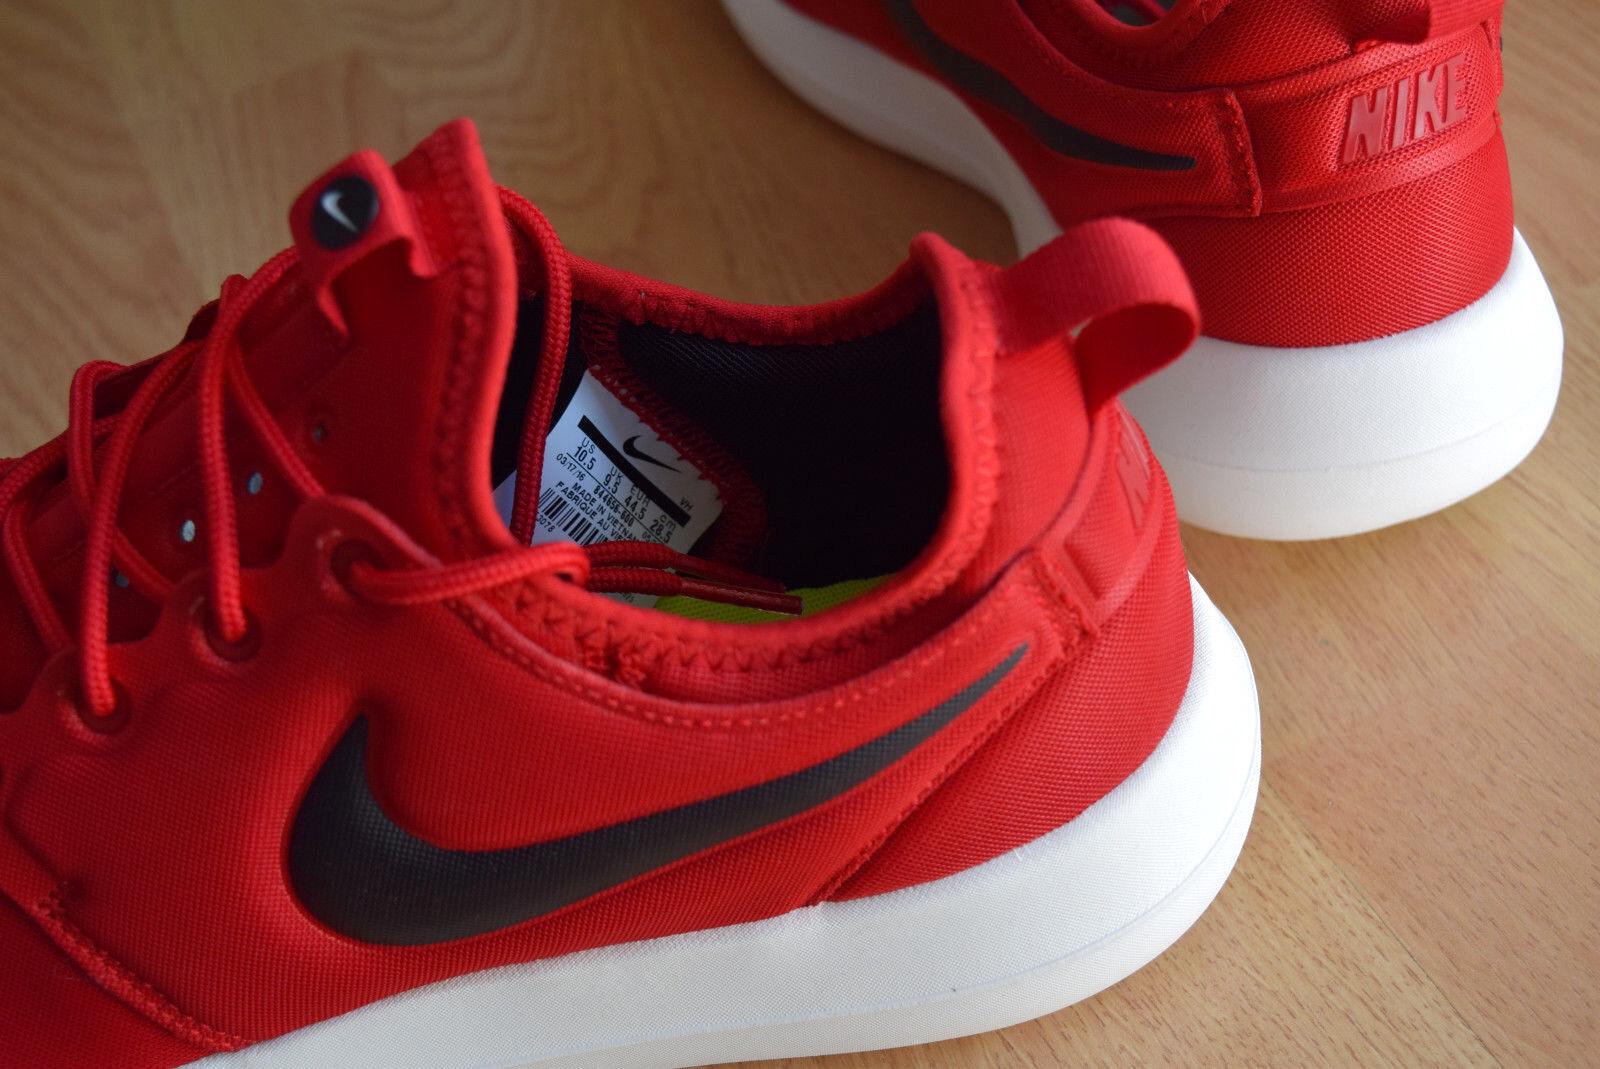 Nike Roshe Two 46 41 42 44 45 46 Two 47 one fReE rUn aIr mAx 1 tAvas presto 844656 600 85f89a